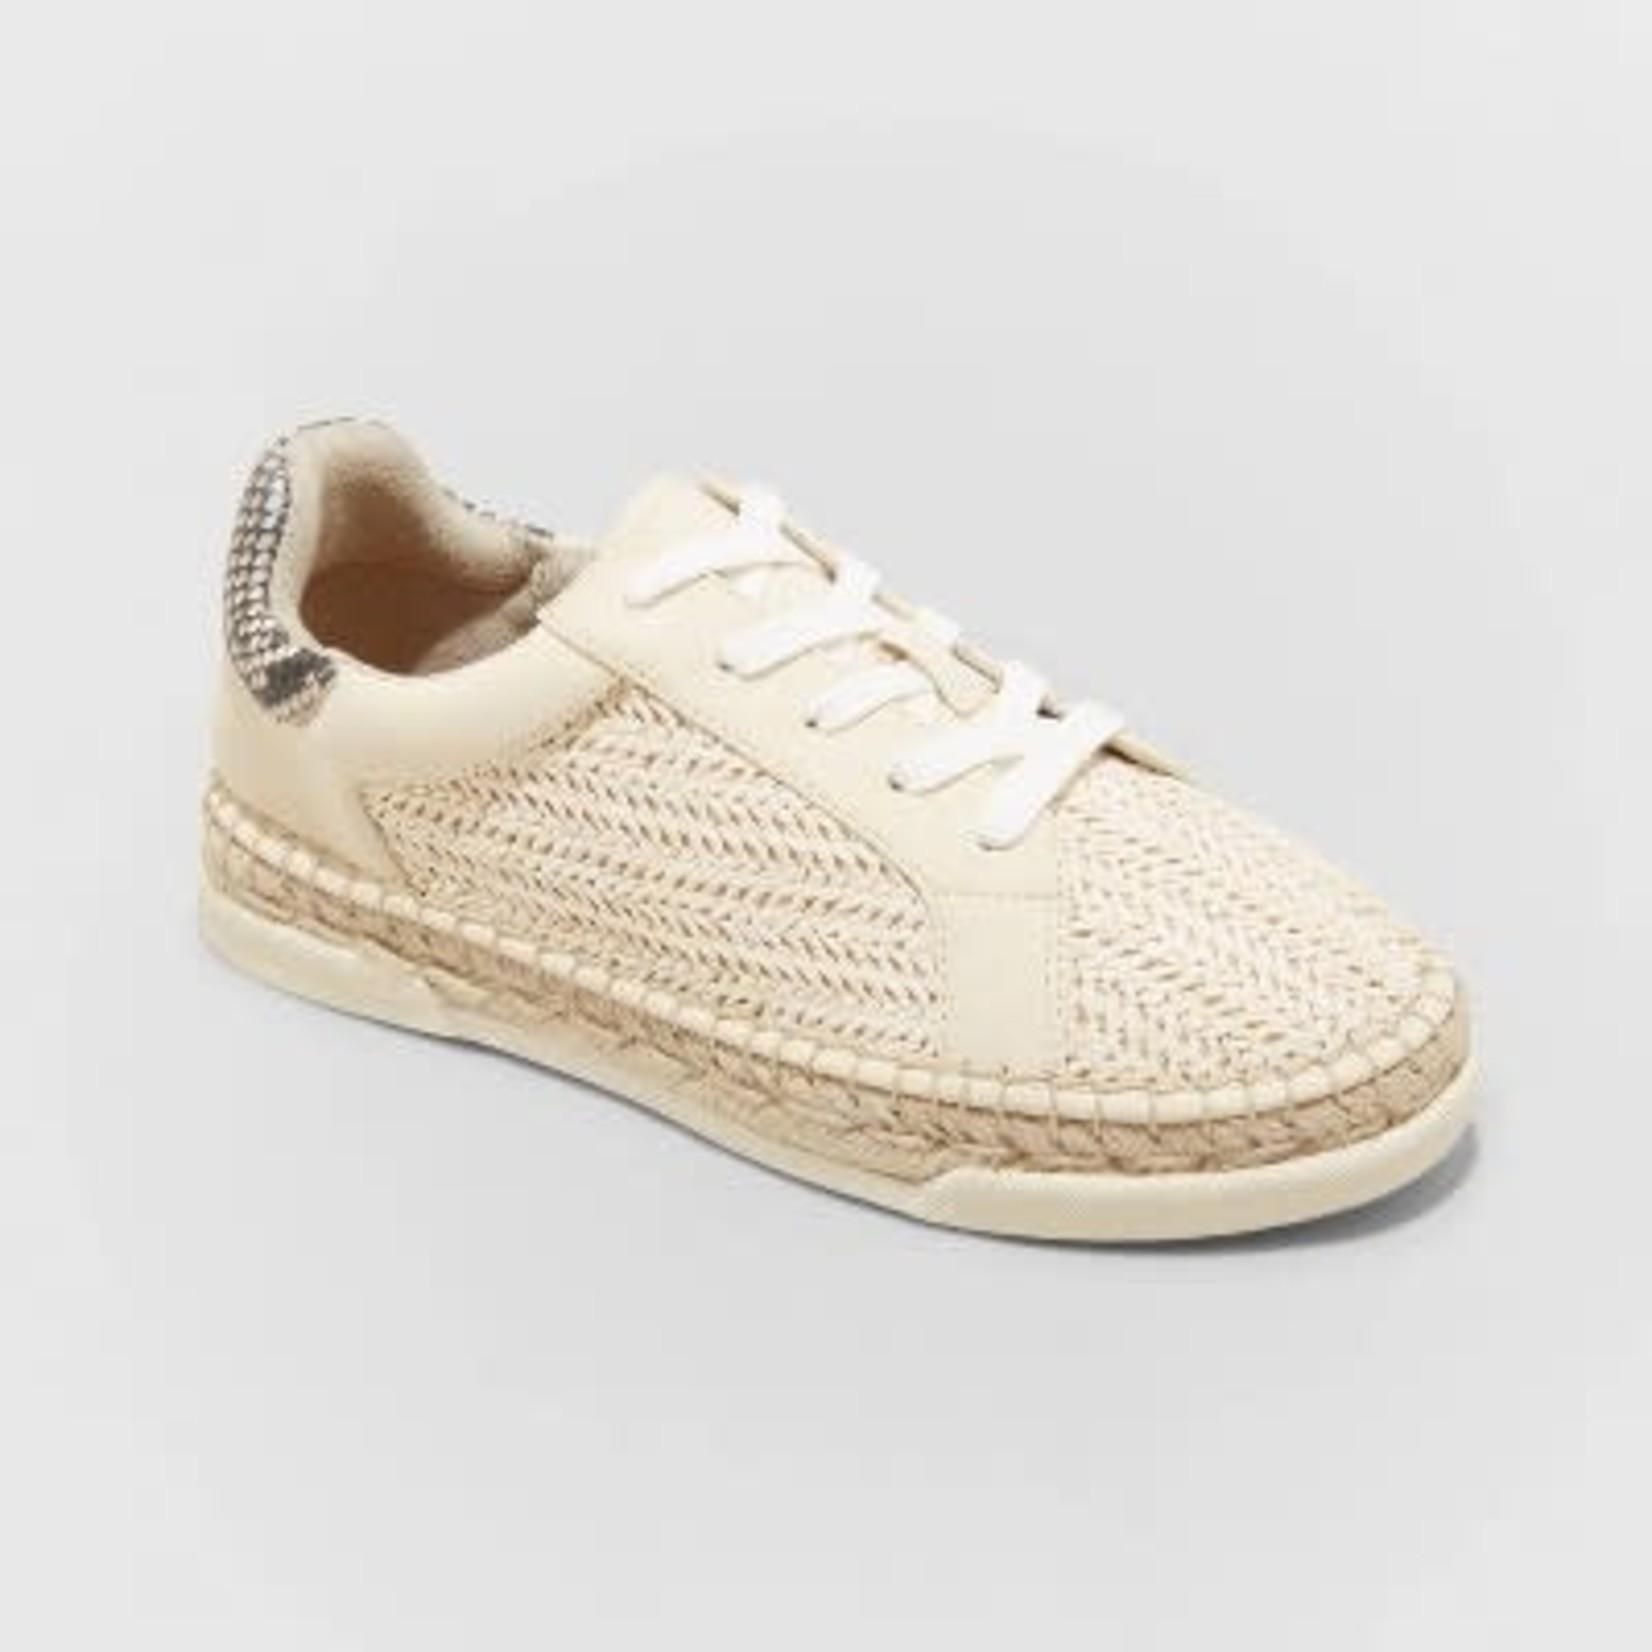 Women's Shaelyn Espadrille Sneakers - Universal Thread - 6